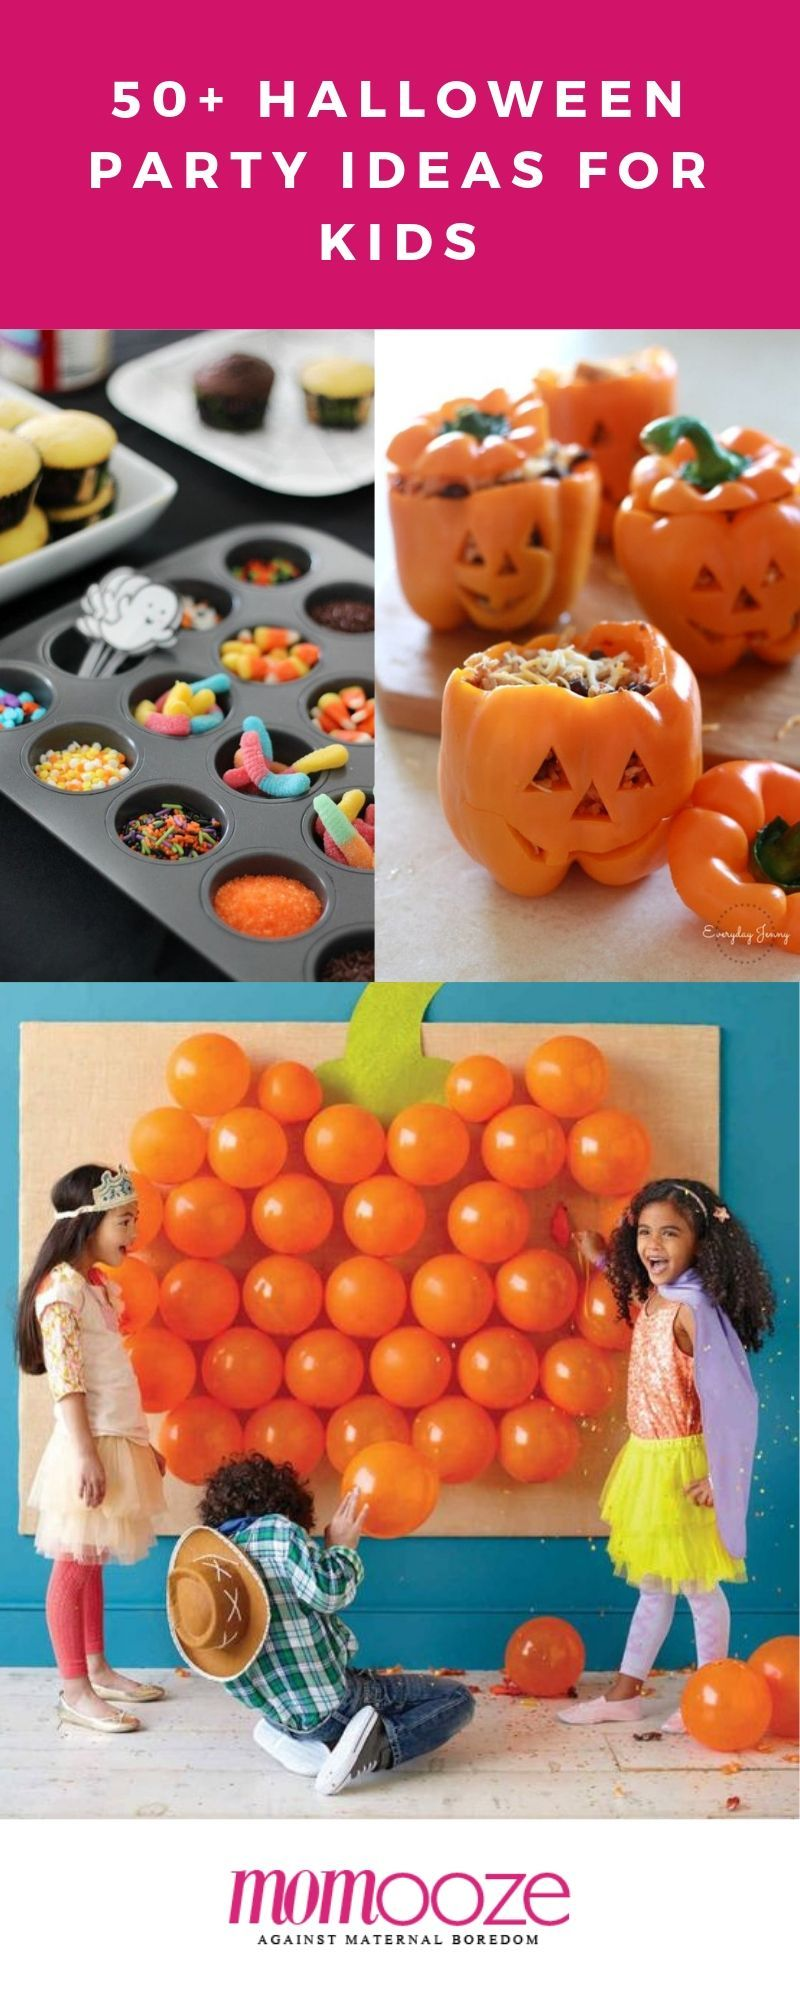 50+ Spooky Halloween Party Ideas for Kids Halloween